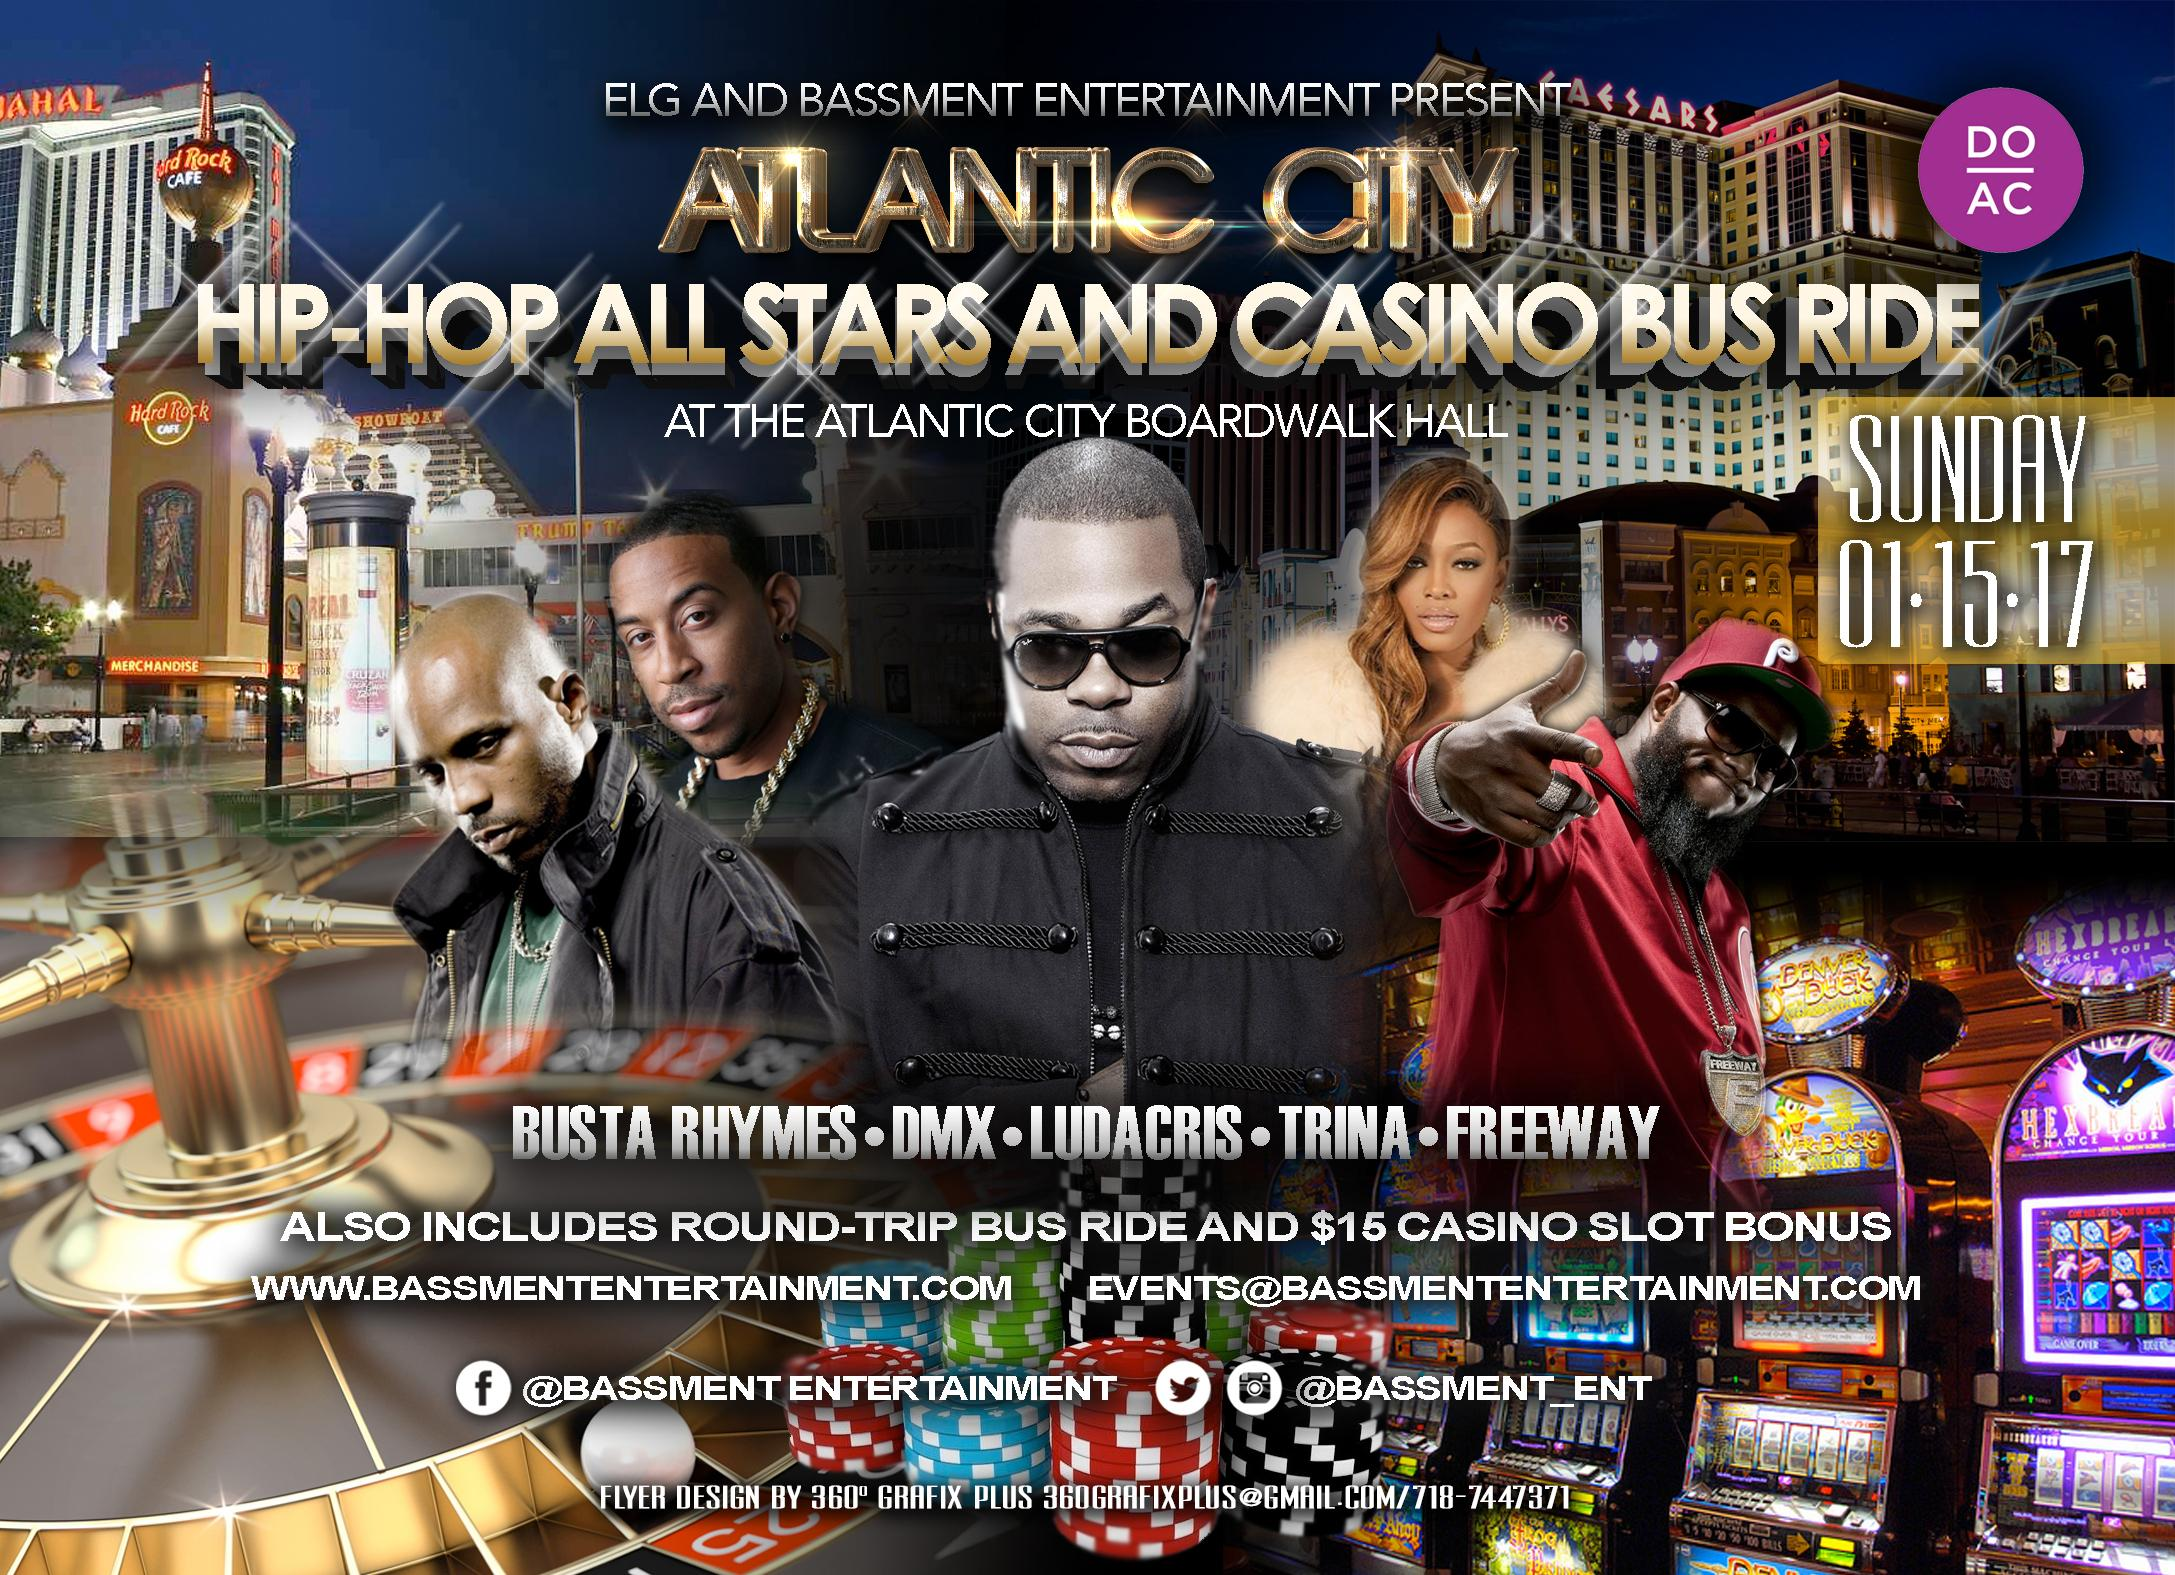 Casino bus ride online spades gambling